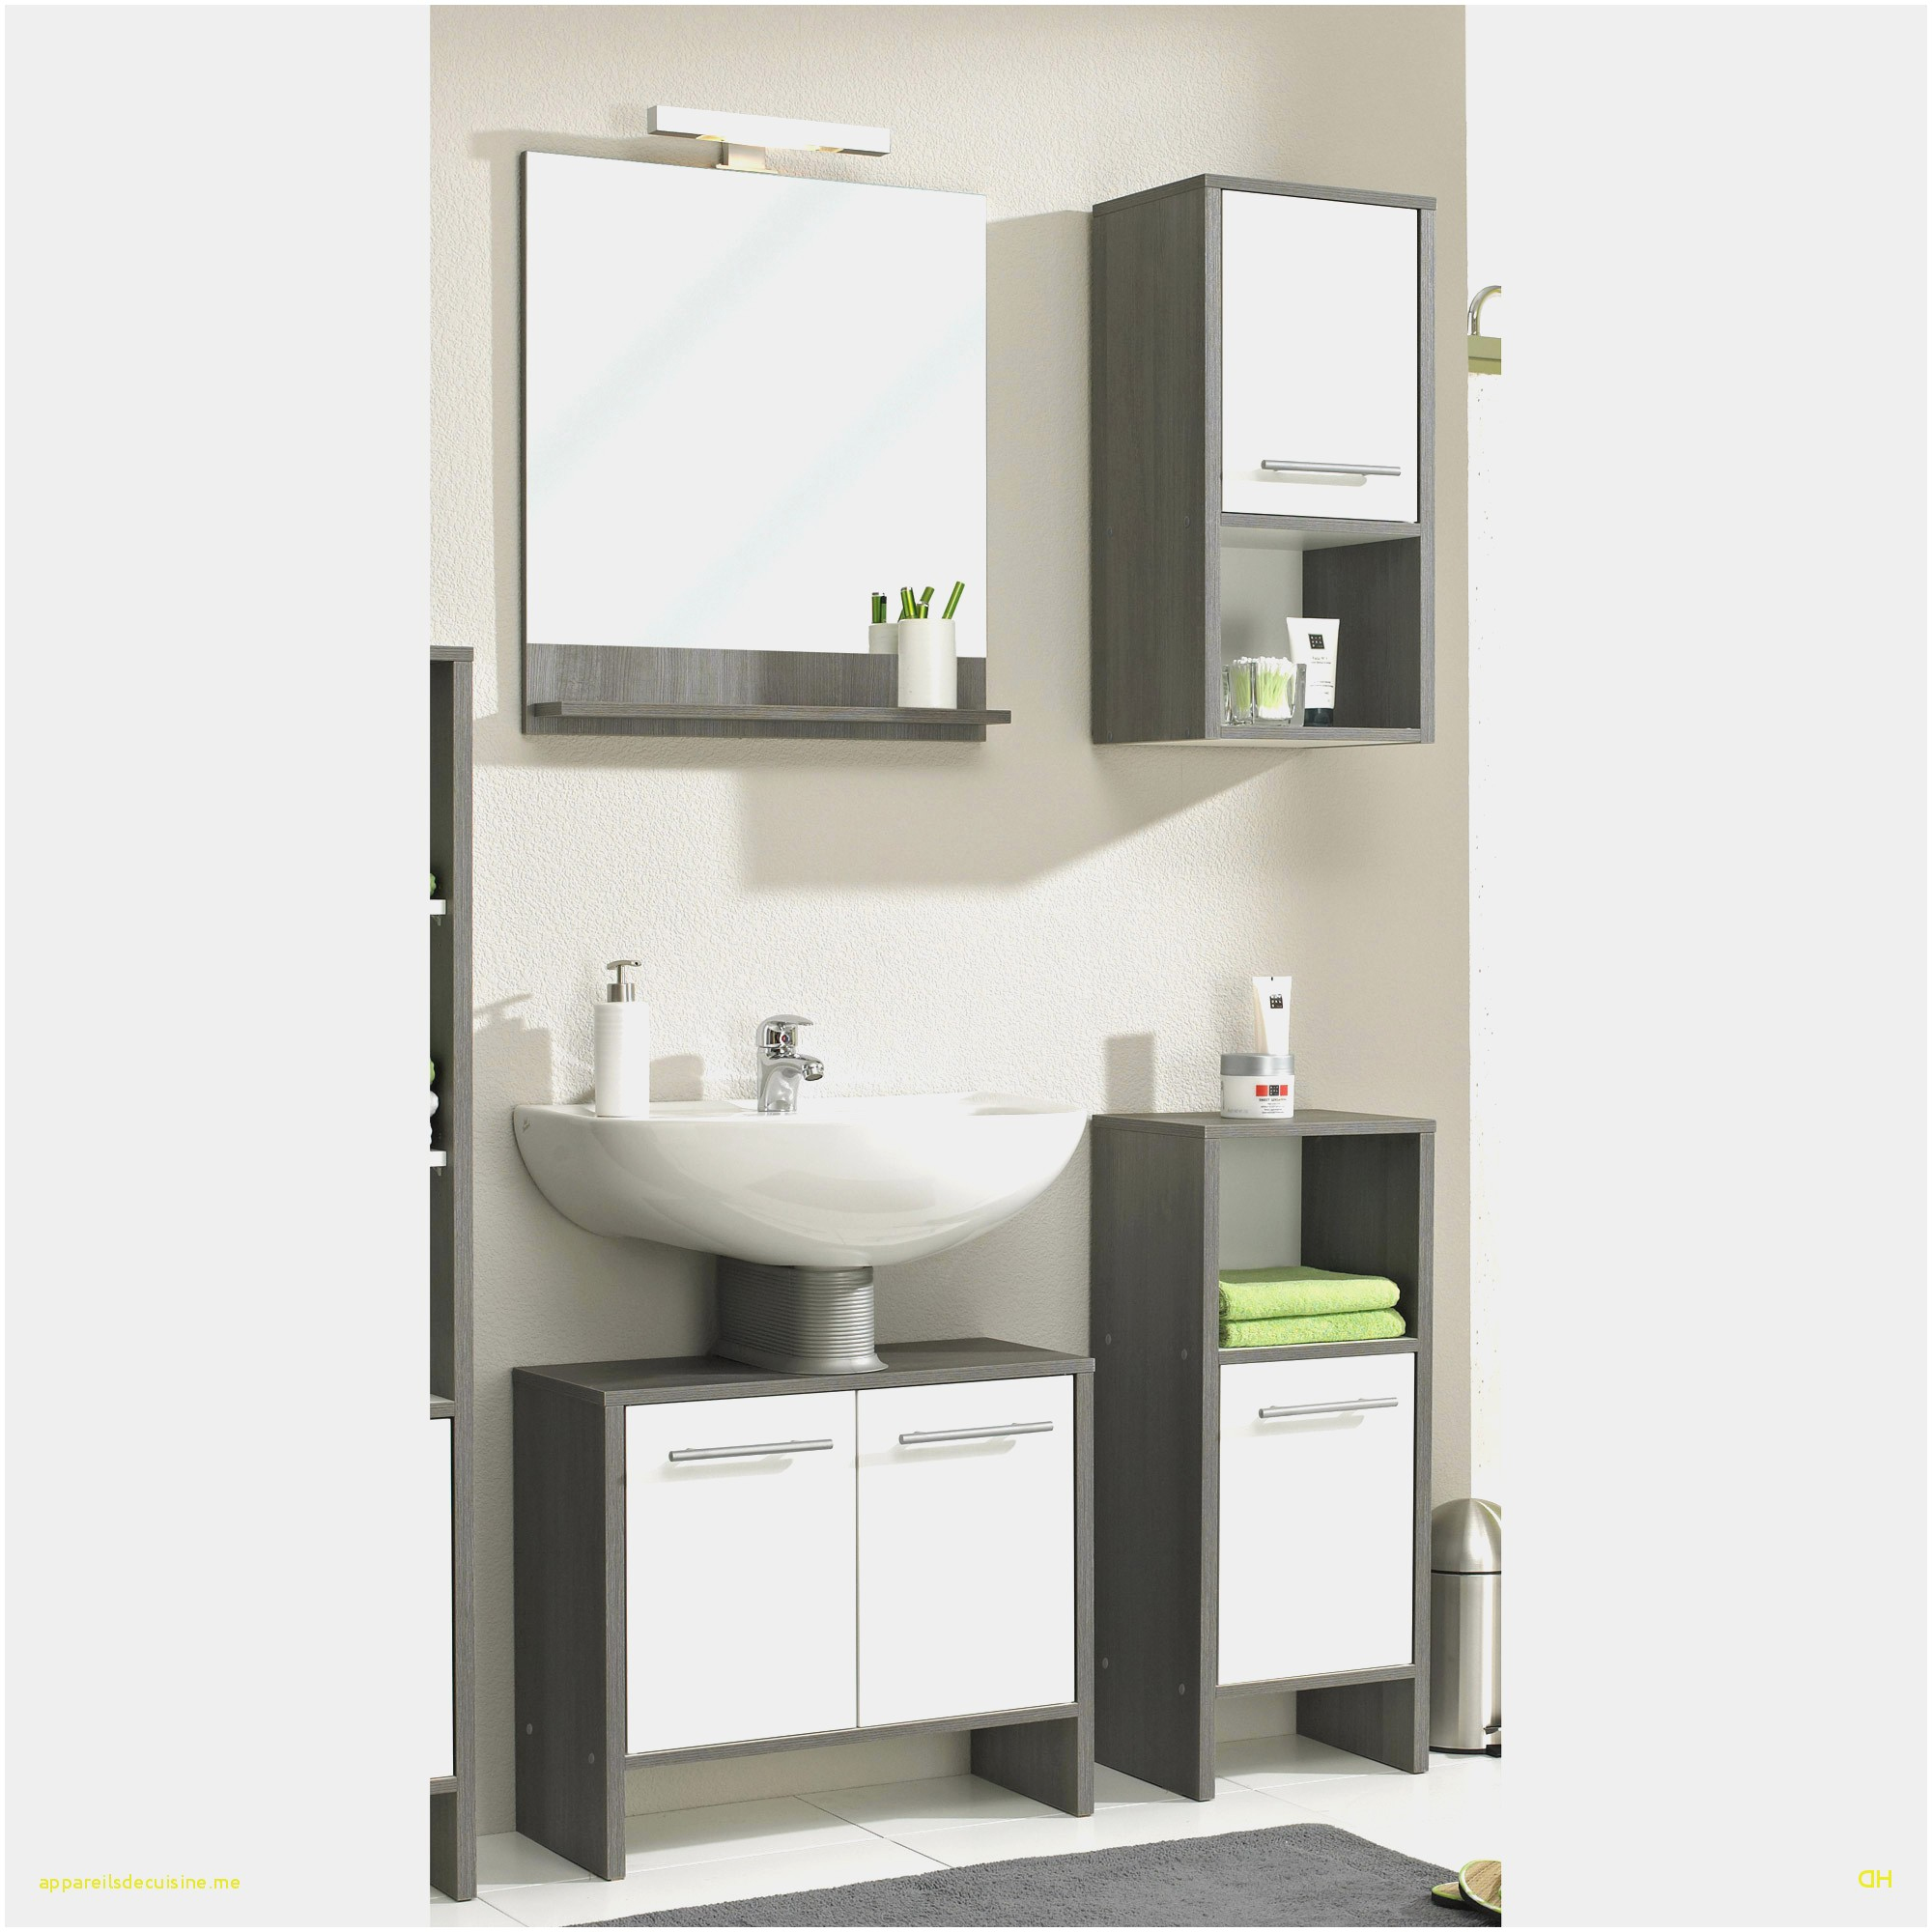 Salles De Bains Ikea Inspirant Stock 10 Nouveau Meuble toilette Ikea Anciendemutu